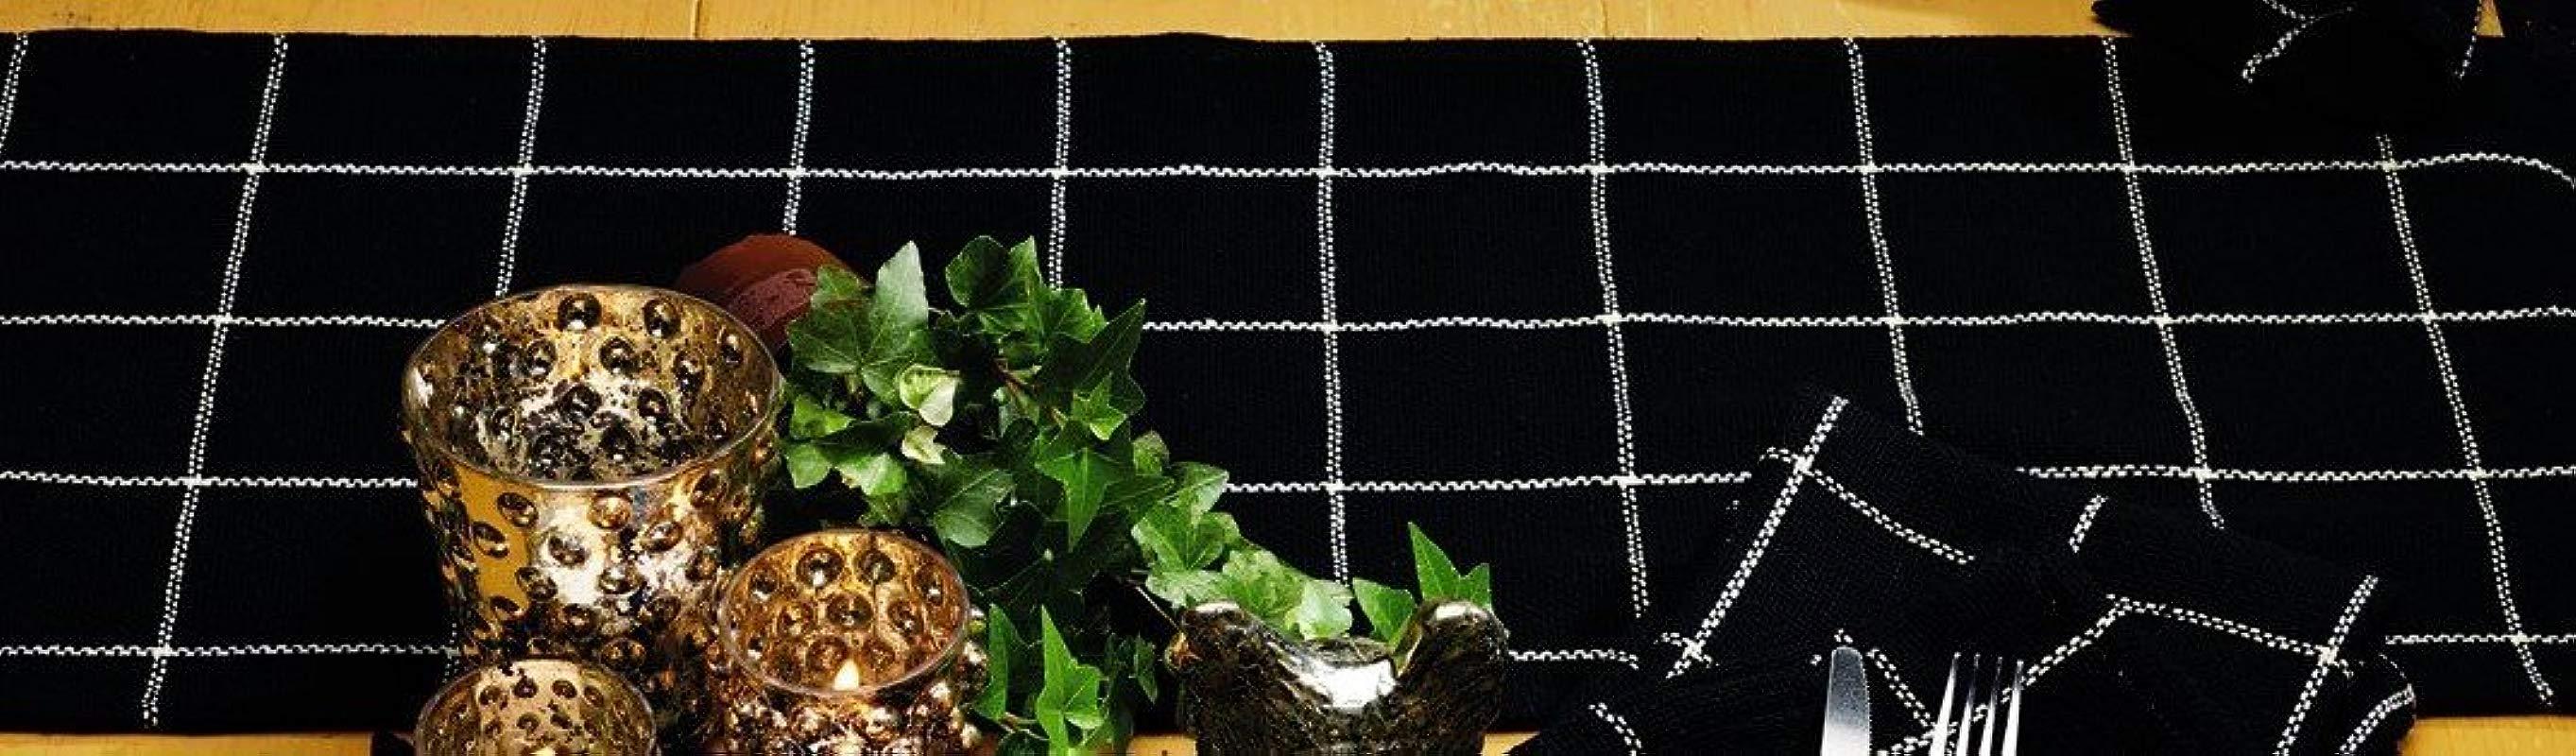 Olivia S Heartland Soft Cotton Burlap Check Black Short Table Runner